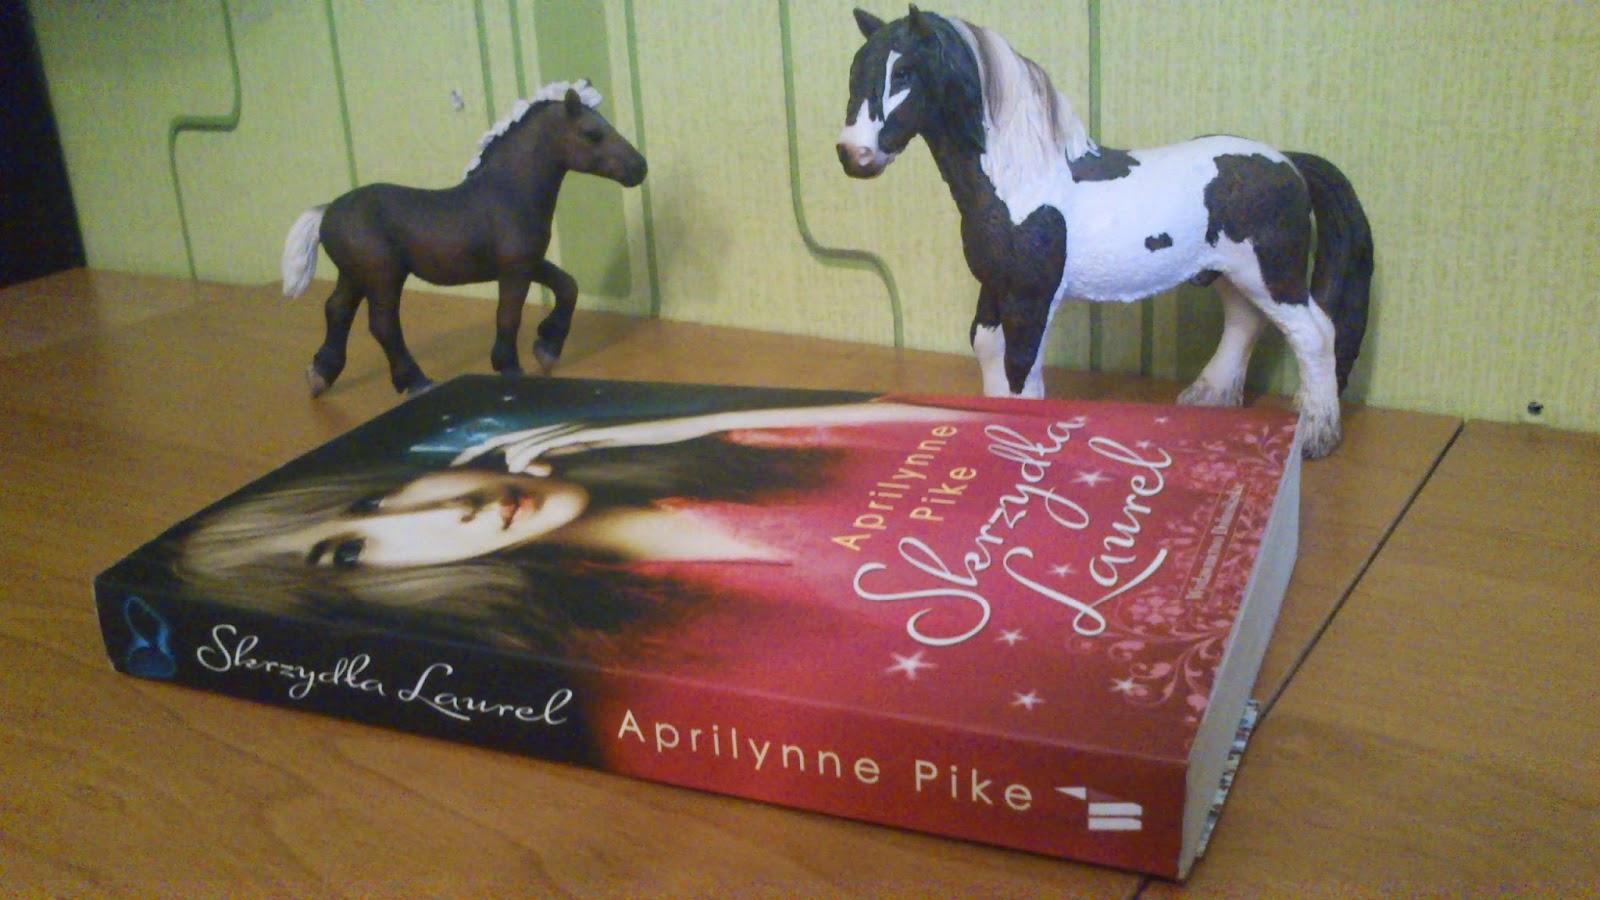 """Skrzydła Laurel"" Aprilynne Pike"